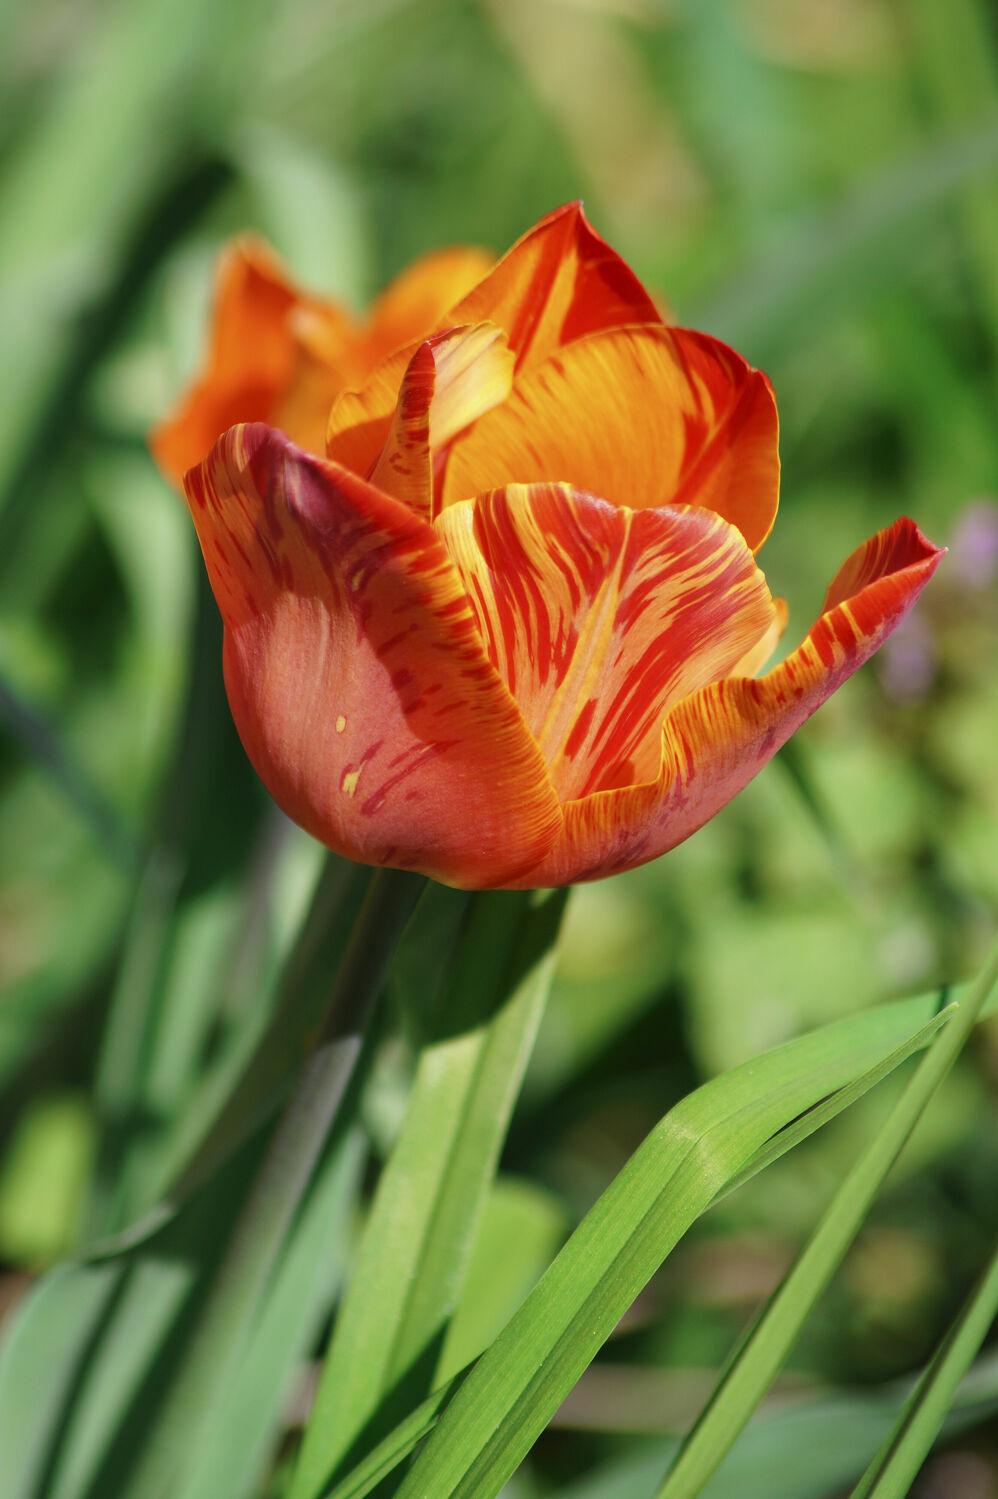 Bild mit Natur, Natur, Rot, Blume, Pflanze, Tulpe, Gras, Muster, garten, blüte